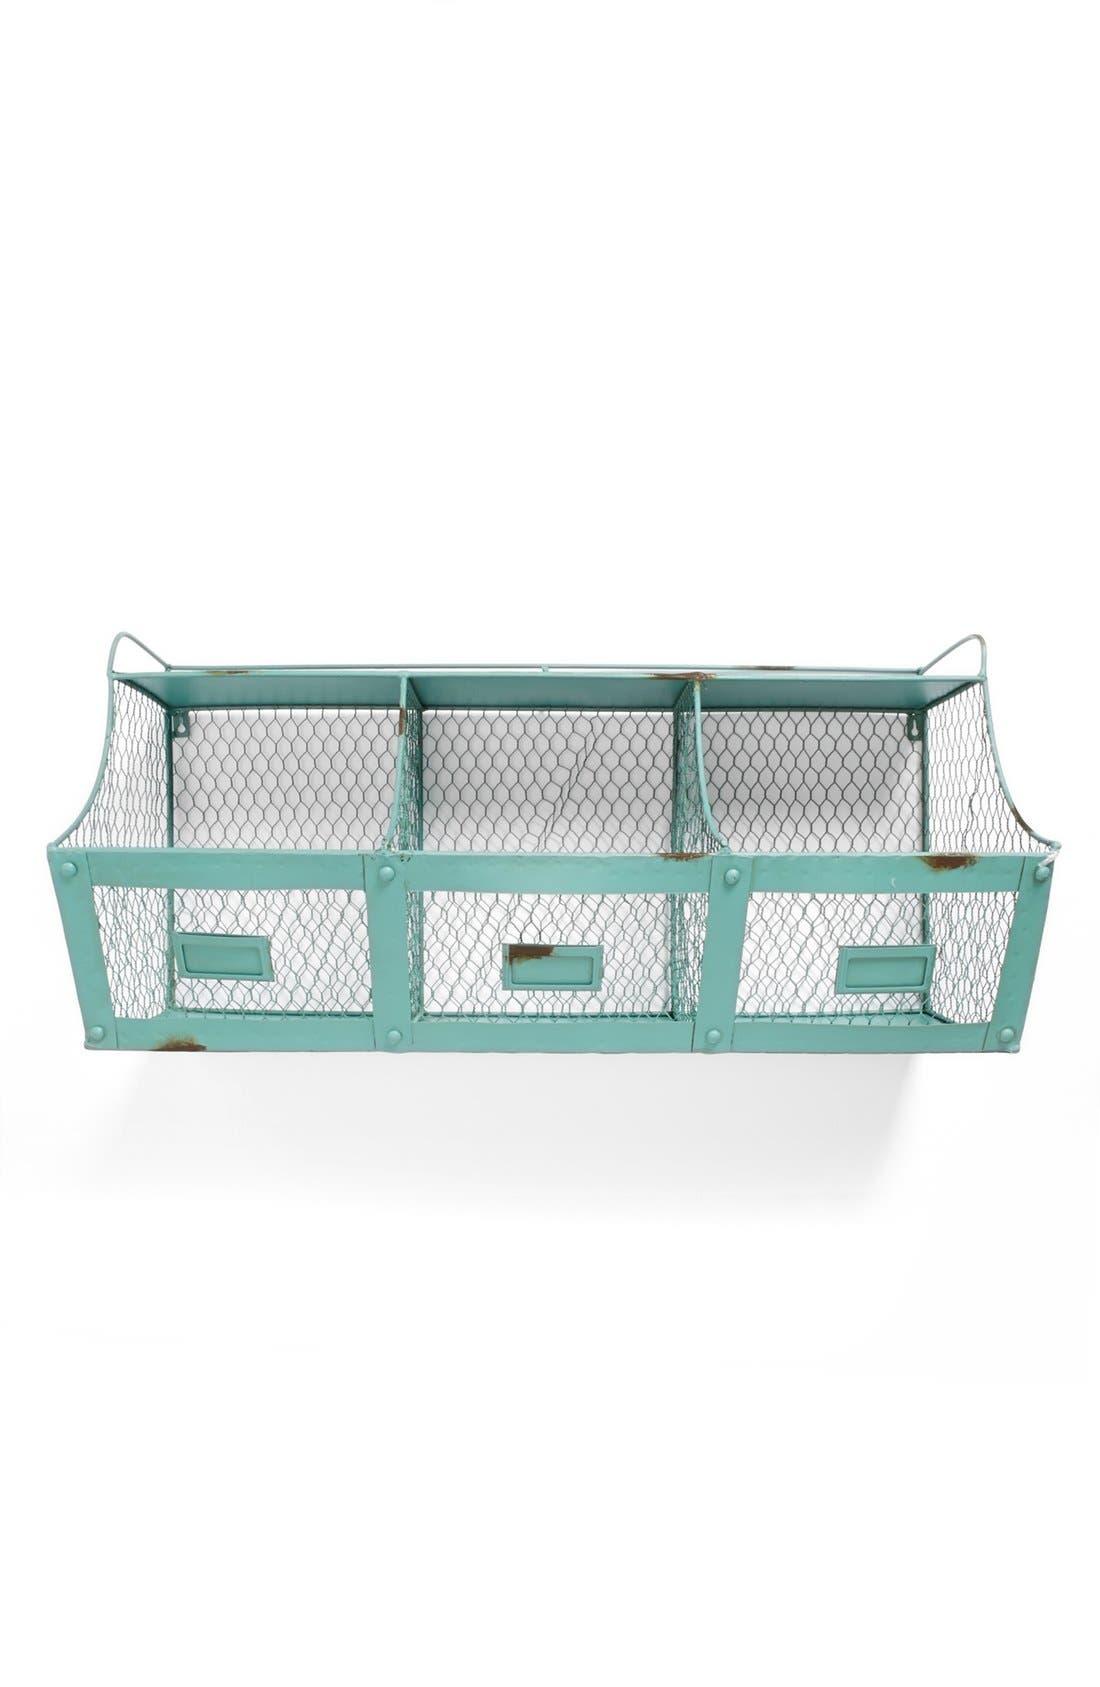 Main Image - Metal Bin Shelf